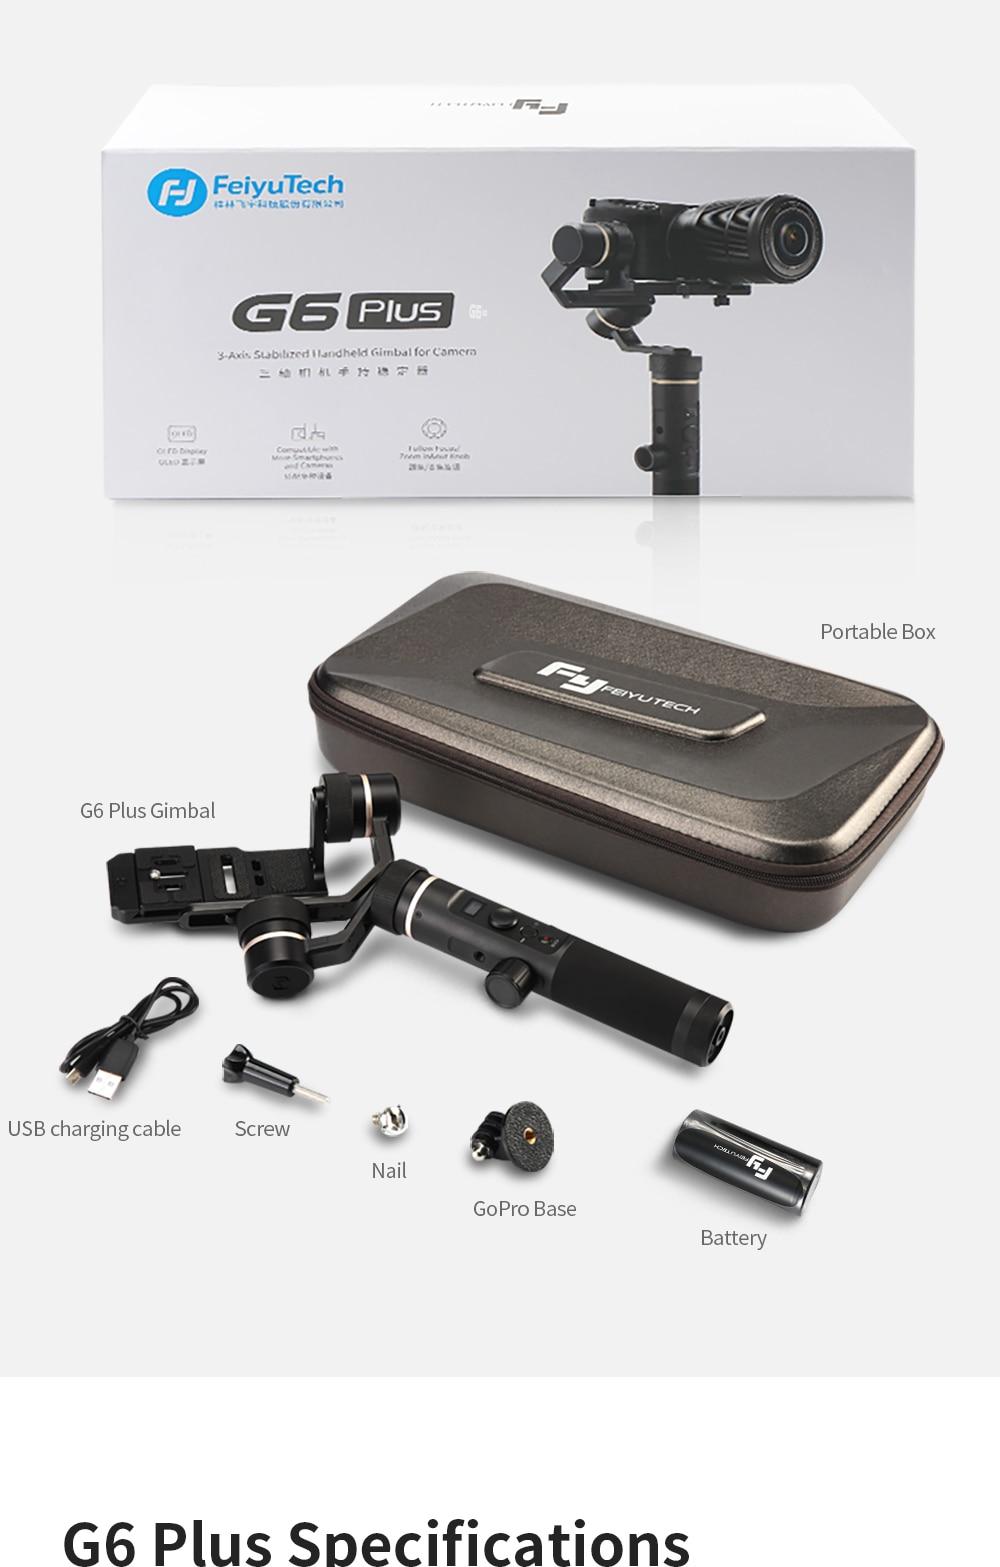 FeiyuTech G6 Plus 3-Axis Handheld Gimbal Stabilizer for Mirrorless Camera Pocket Camera GoPro Smartphone Payload 800g Feiyu G6P 15